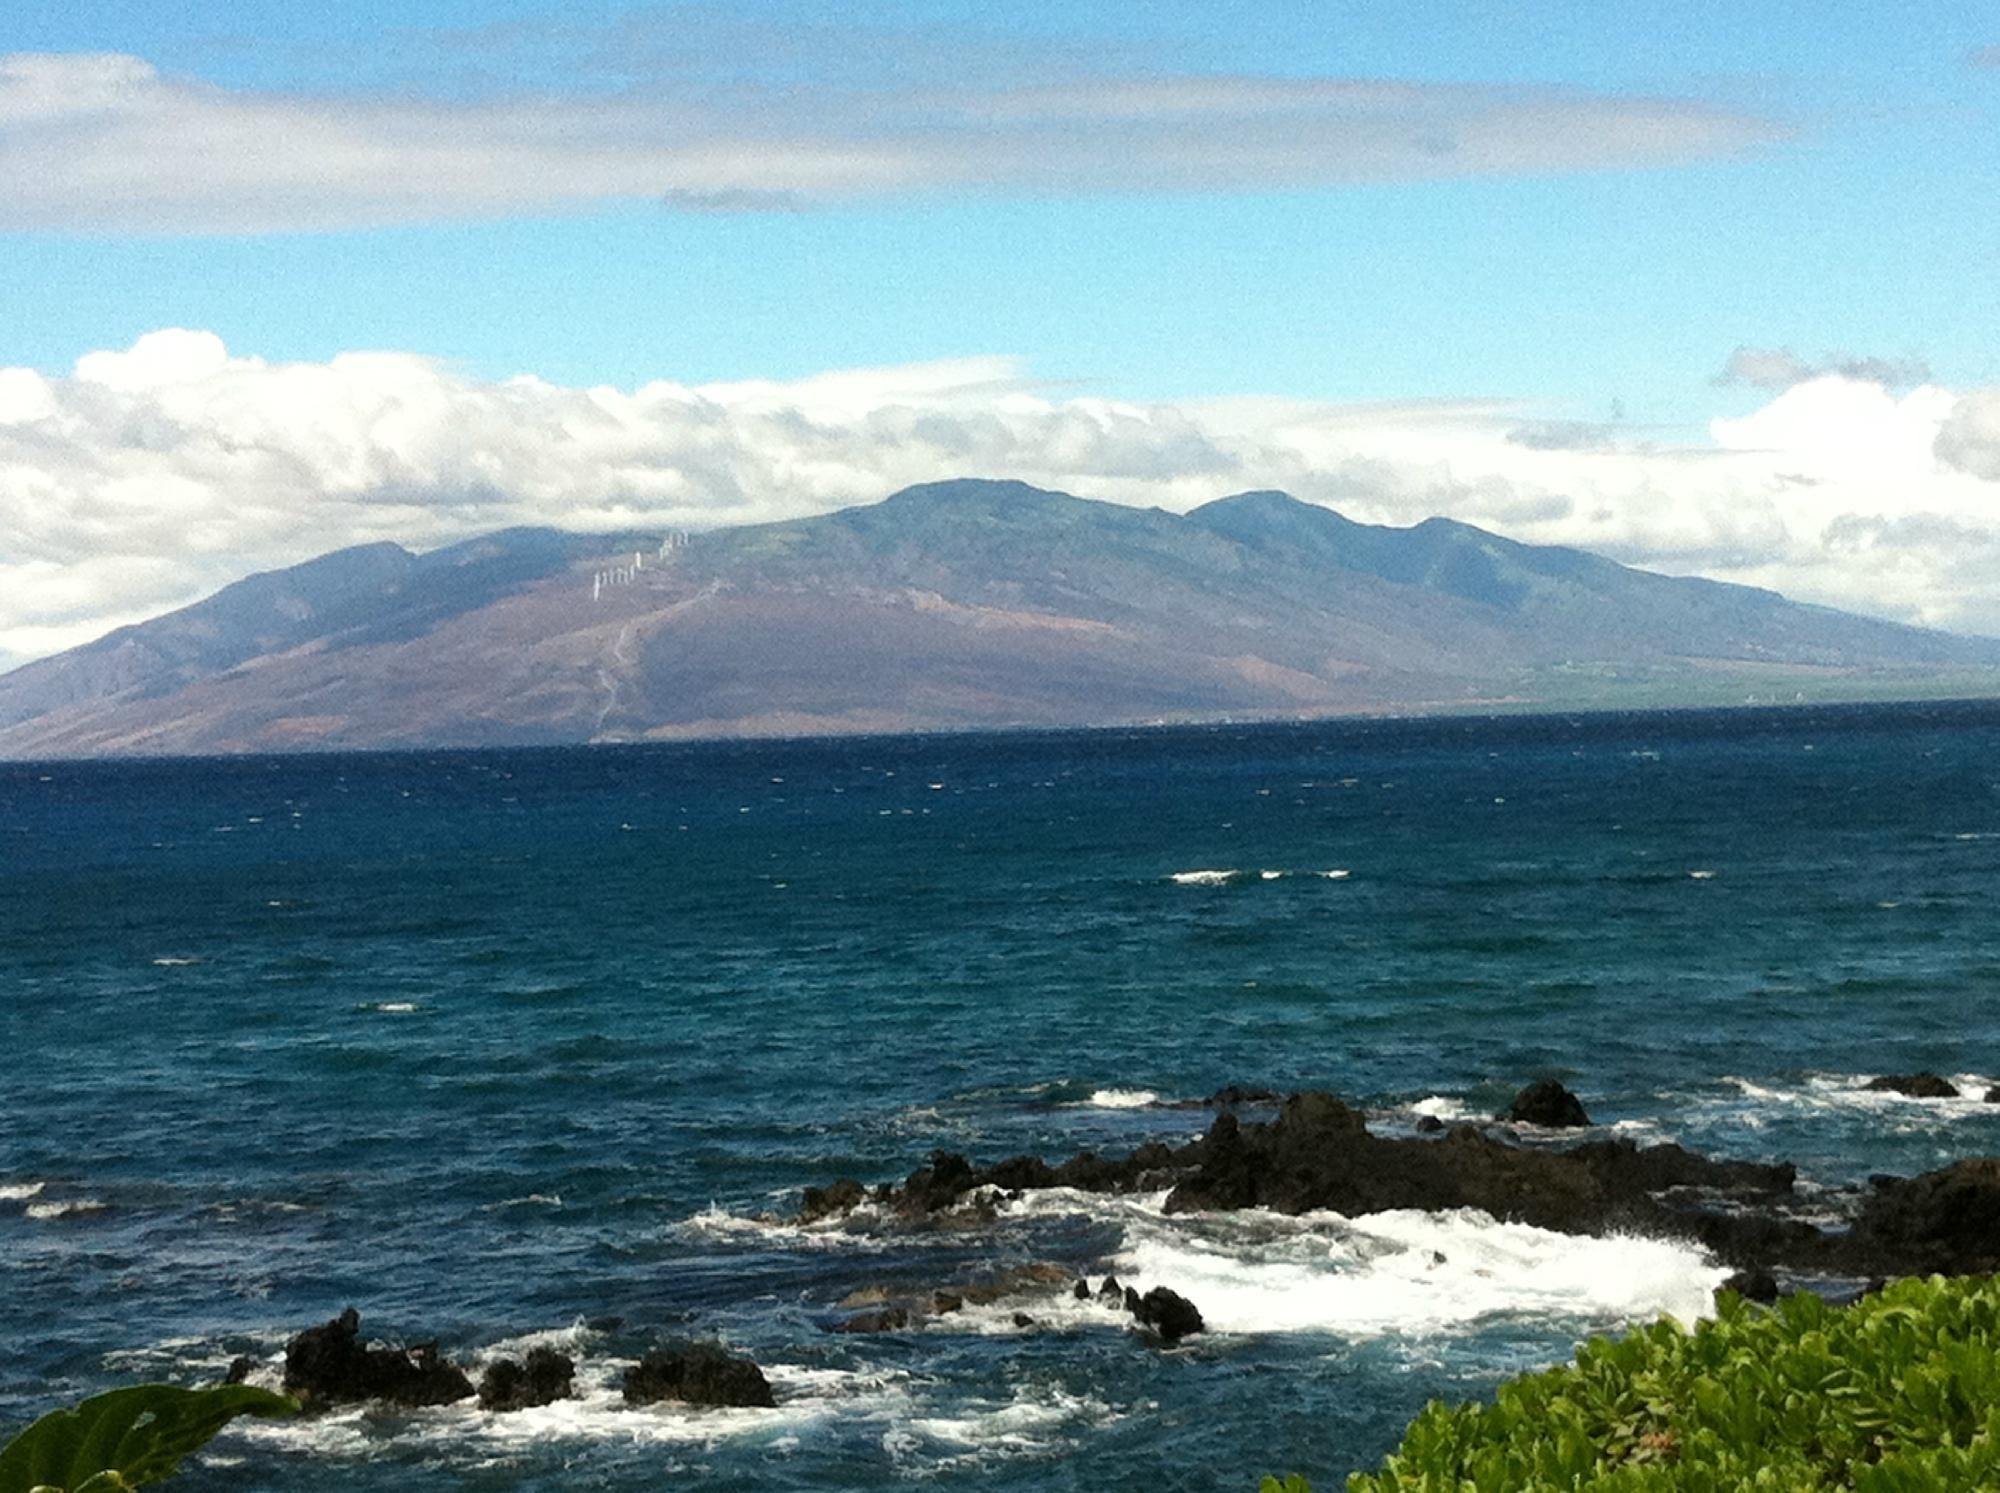 Four Seasons Resort Maui at Wailea - Resort Reviews - TripAdvisor